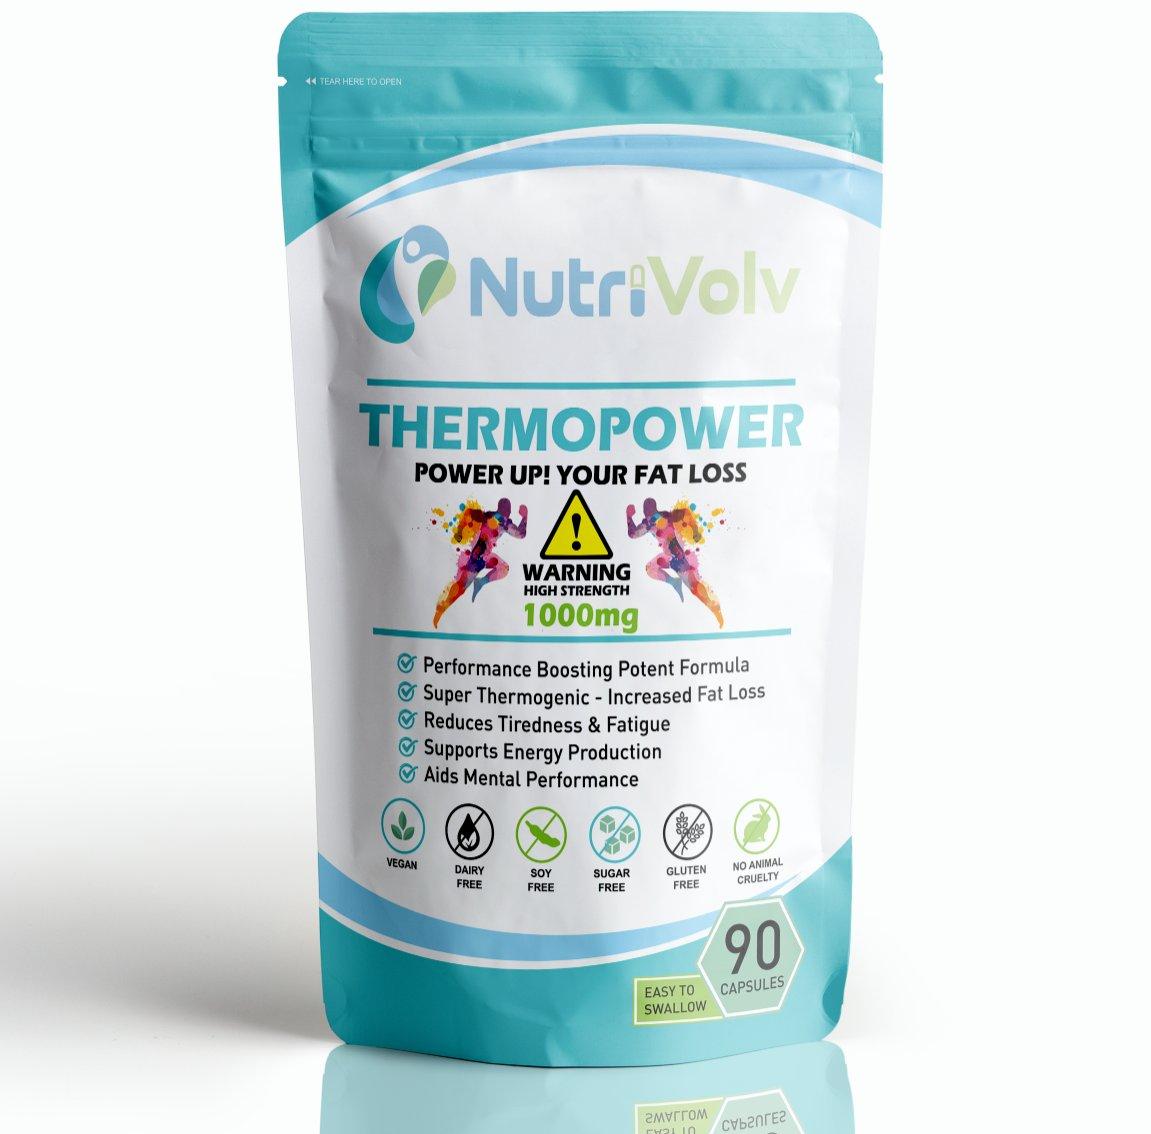 ThermoPower 1000mg - Thermogenic T5 FAT LOSS DETONATOR Green Tea Keto Formula